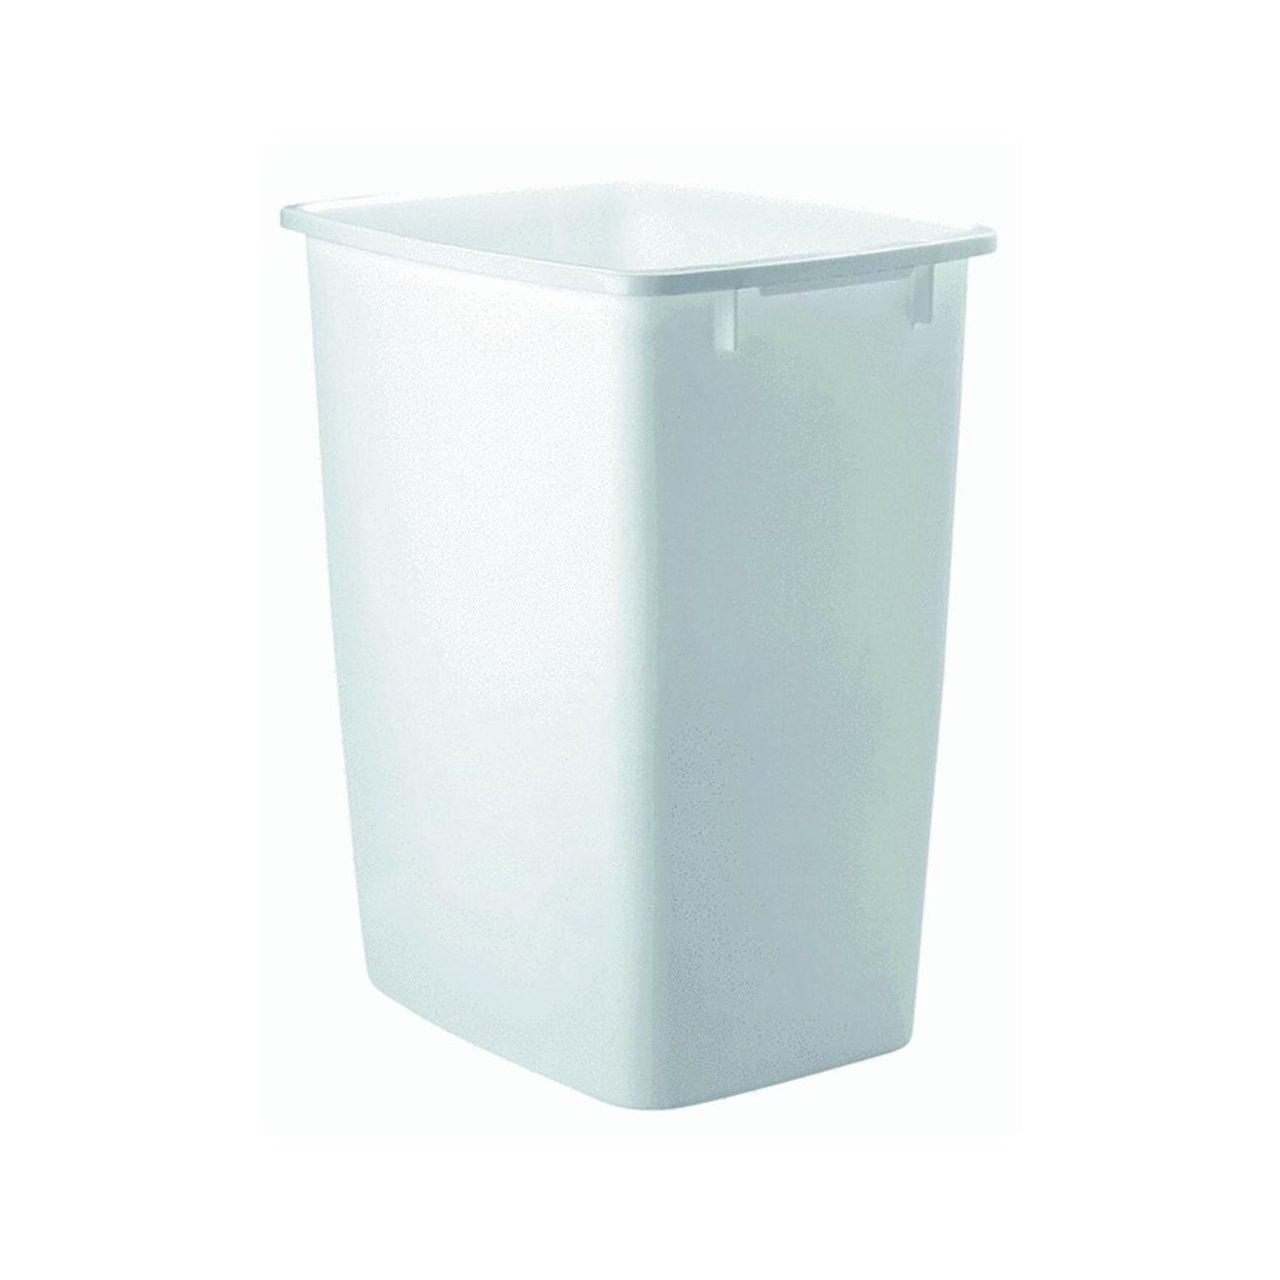 Rubbermaid - FG2806TPWHT Open Wastebasket (White) (36 Quart)